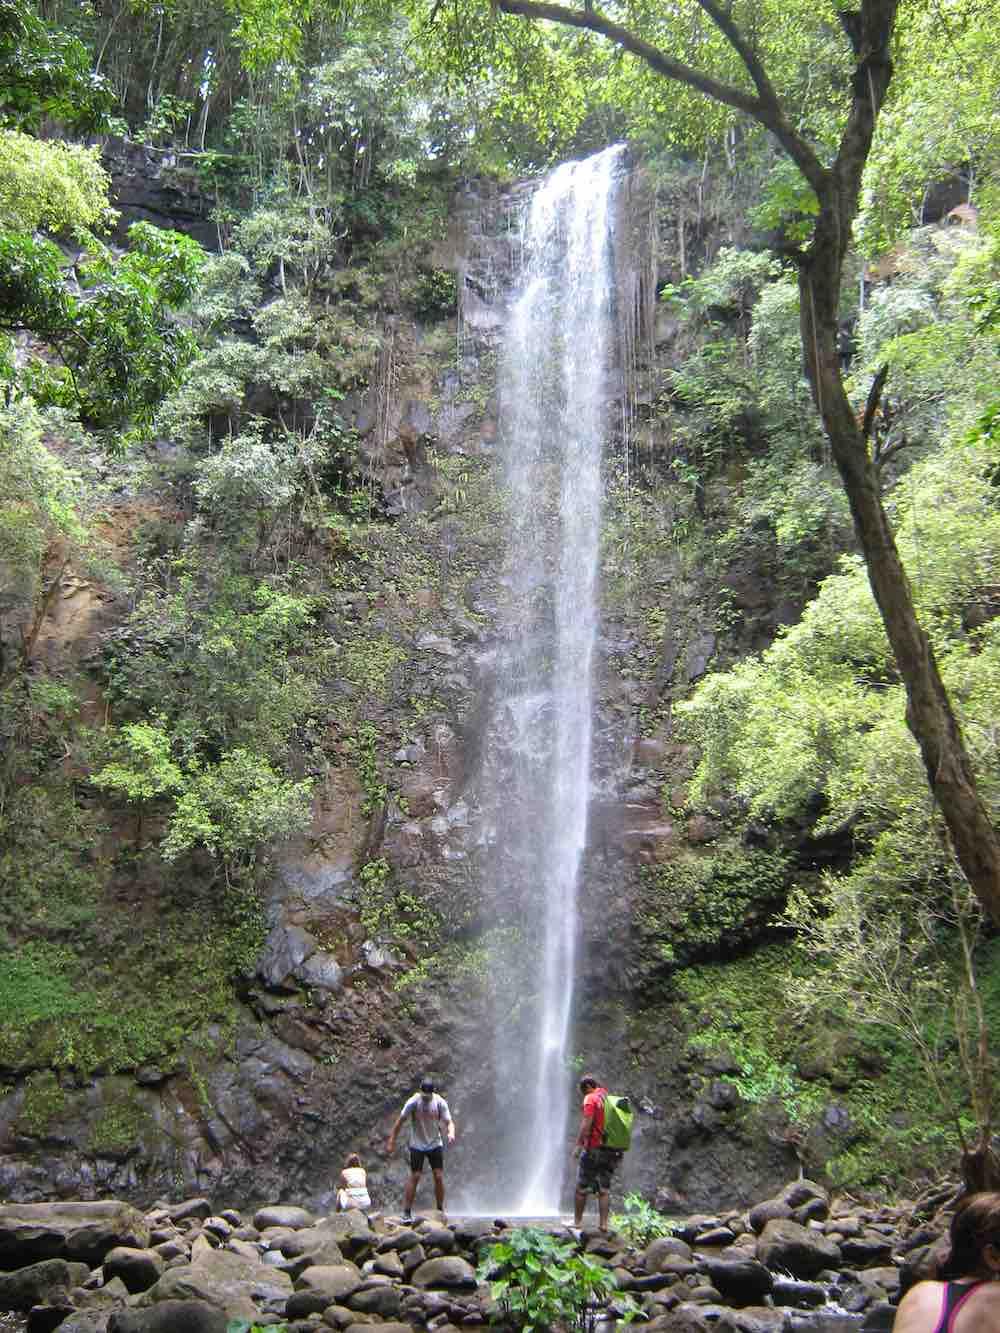 7 Prettiest Best Hawaii Waterfalls to visit featured by top Hawaii blog, Hawaii Travel with Kids: Uluwehi Falls is one of the prettiest Kauai waterfalls